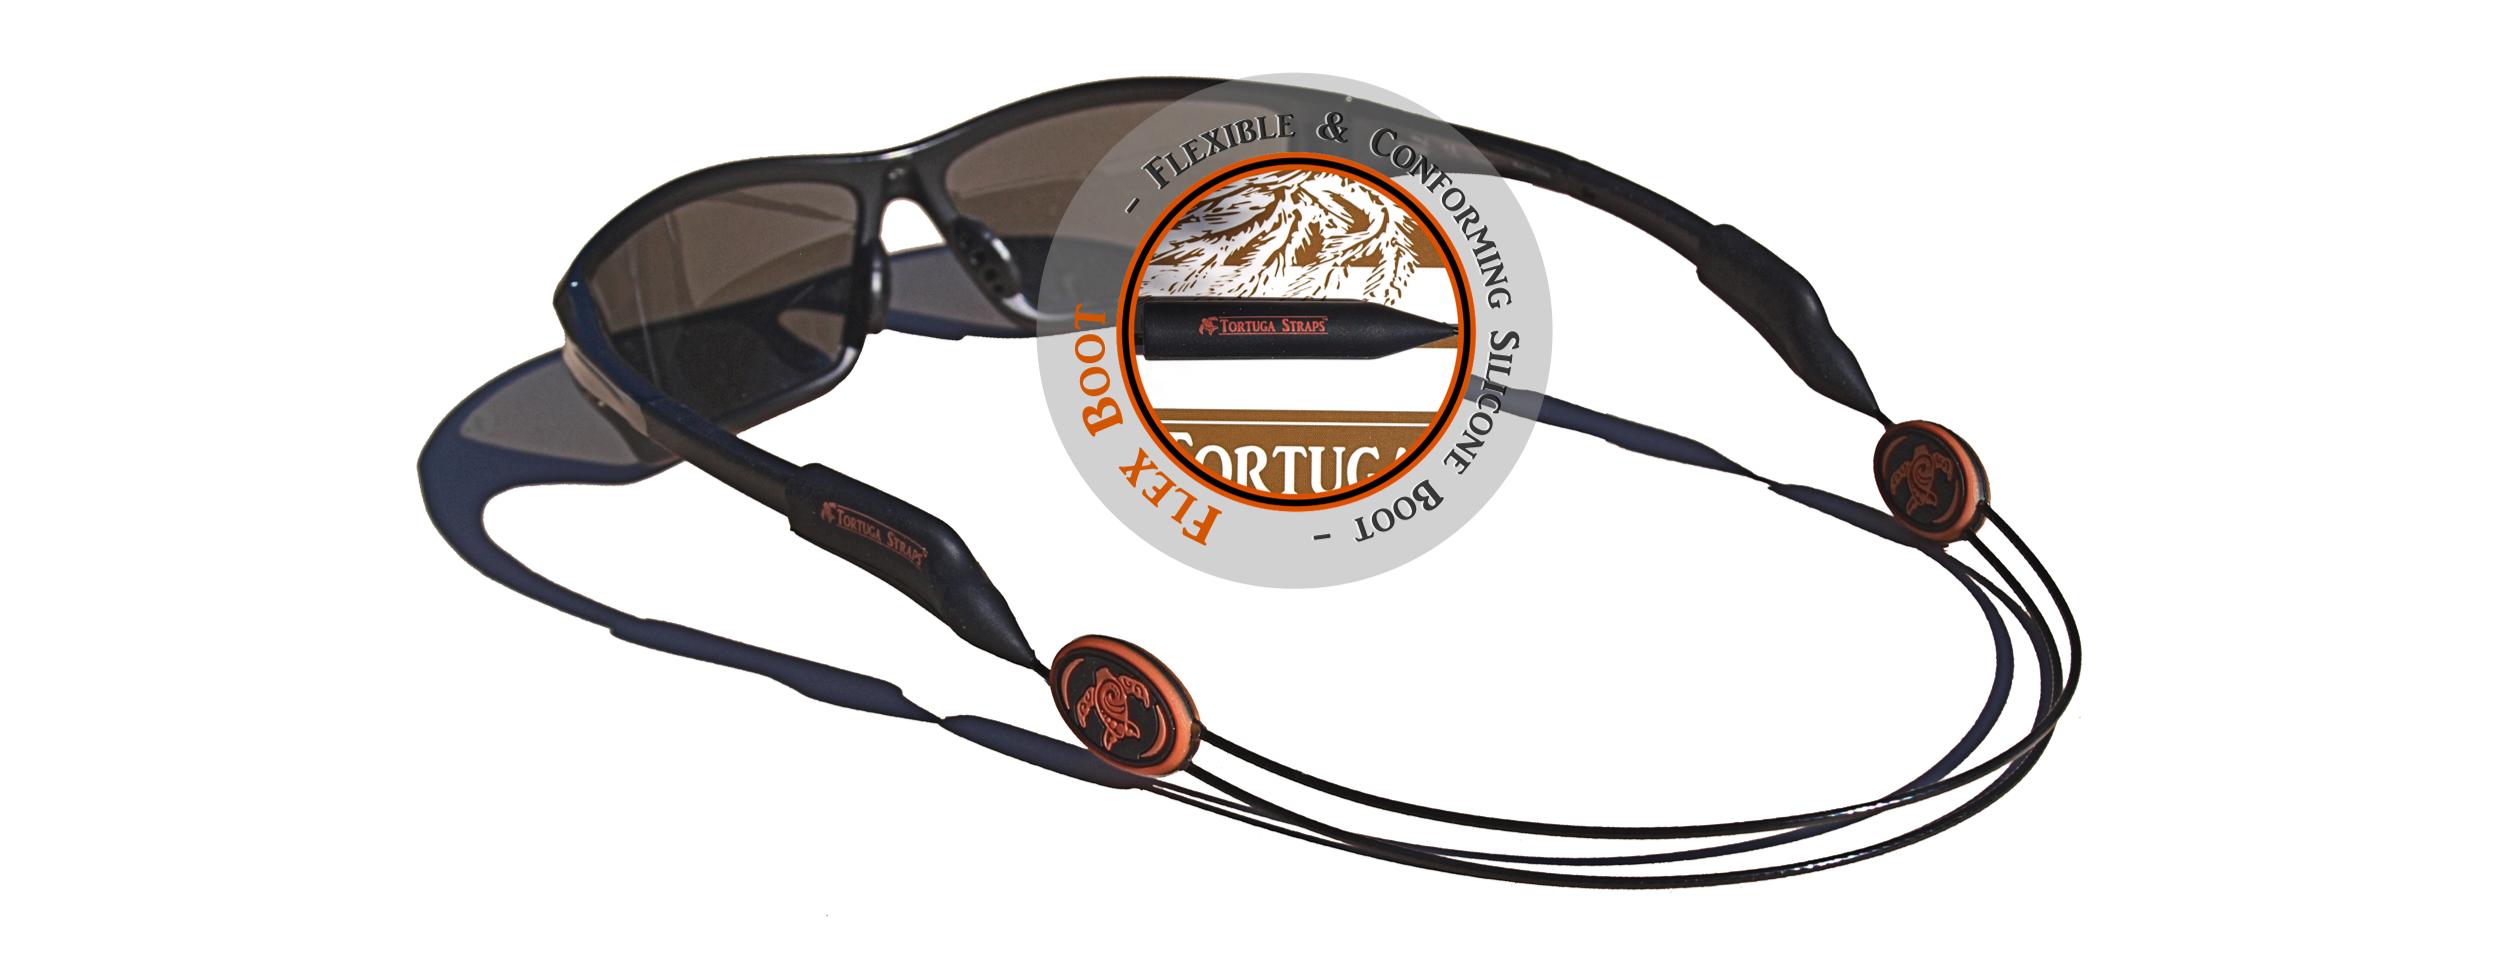 Tortuga Straps LINEZ Orange on Black Adjustable Sunglass Straps